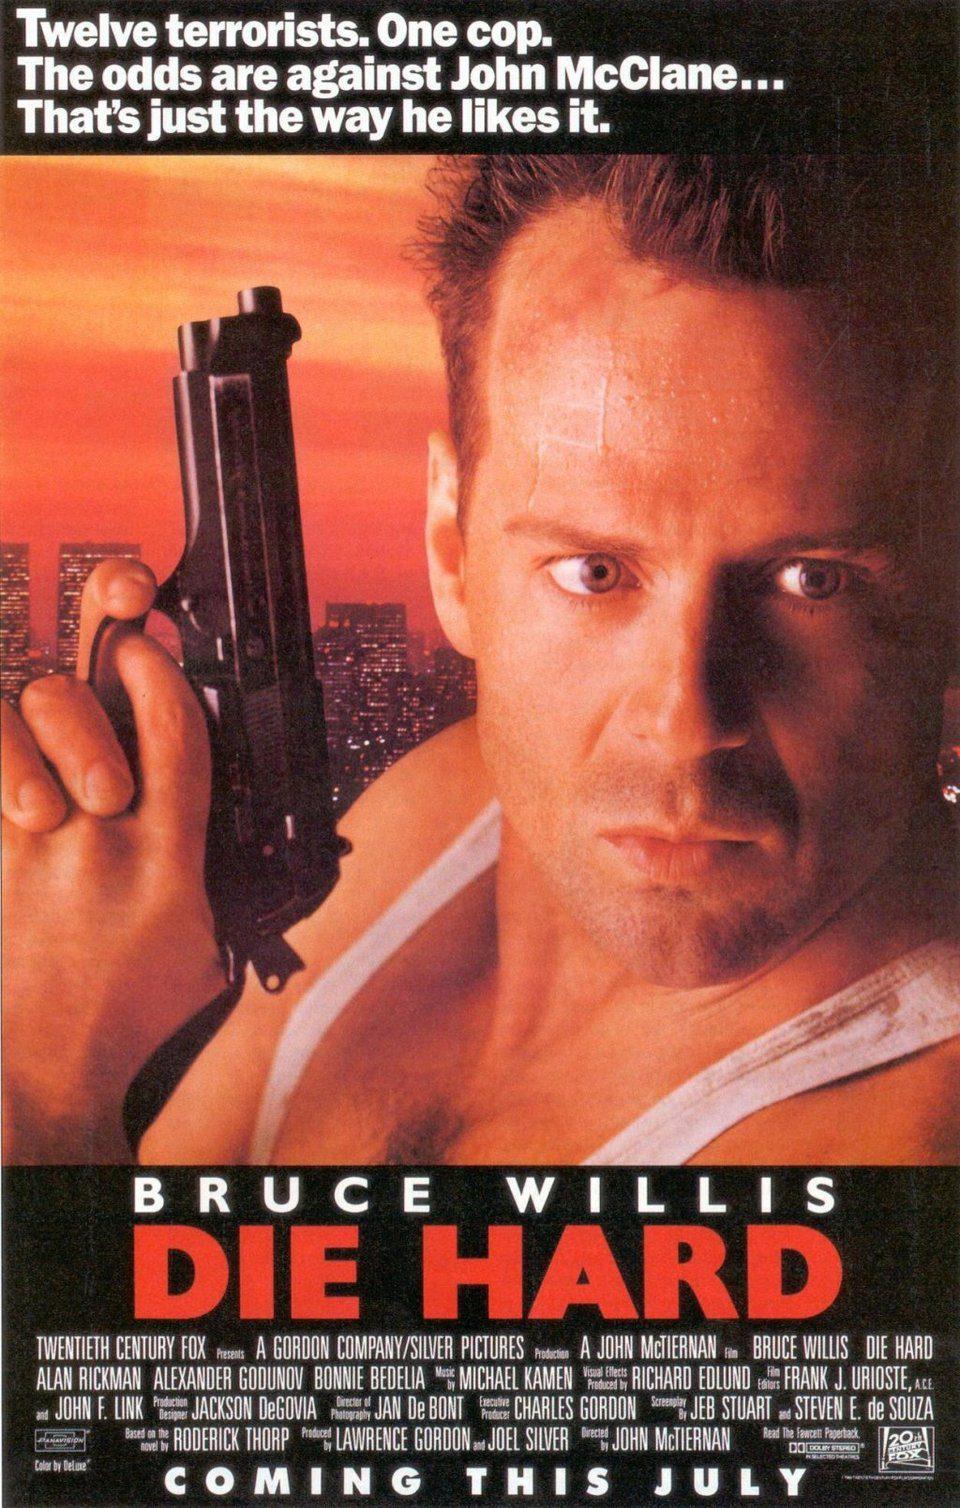 Estados Unidos poster for Die Hard